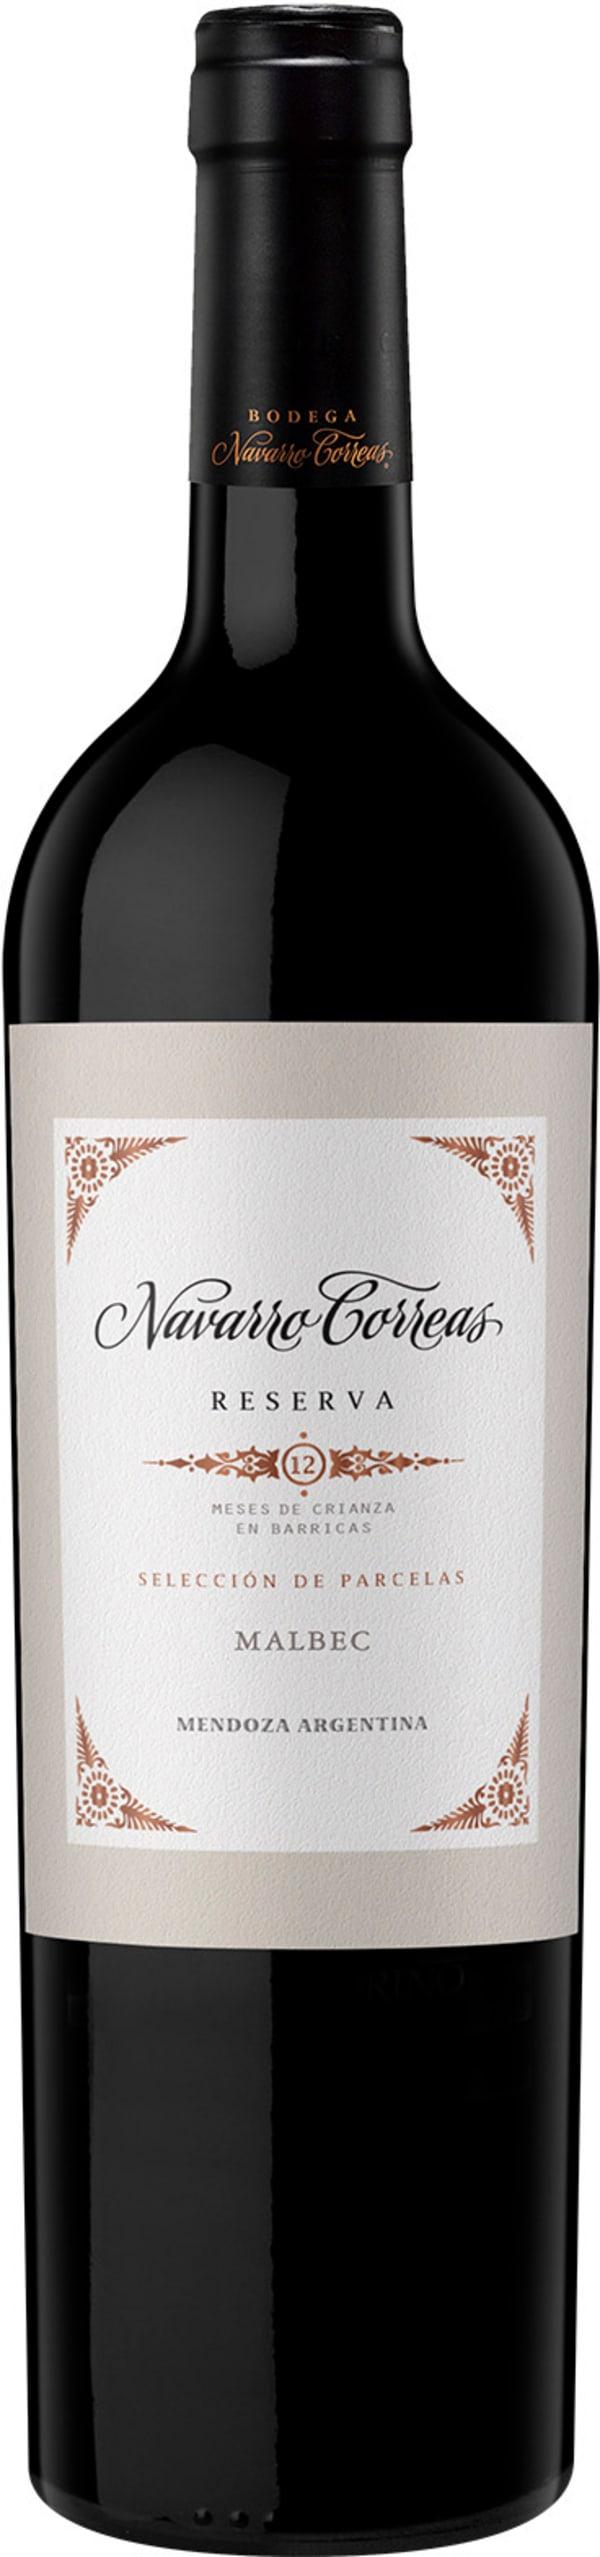 Navarro Correas Reserve Malbec 2016